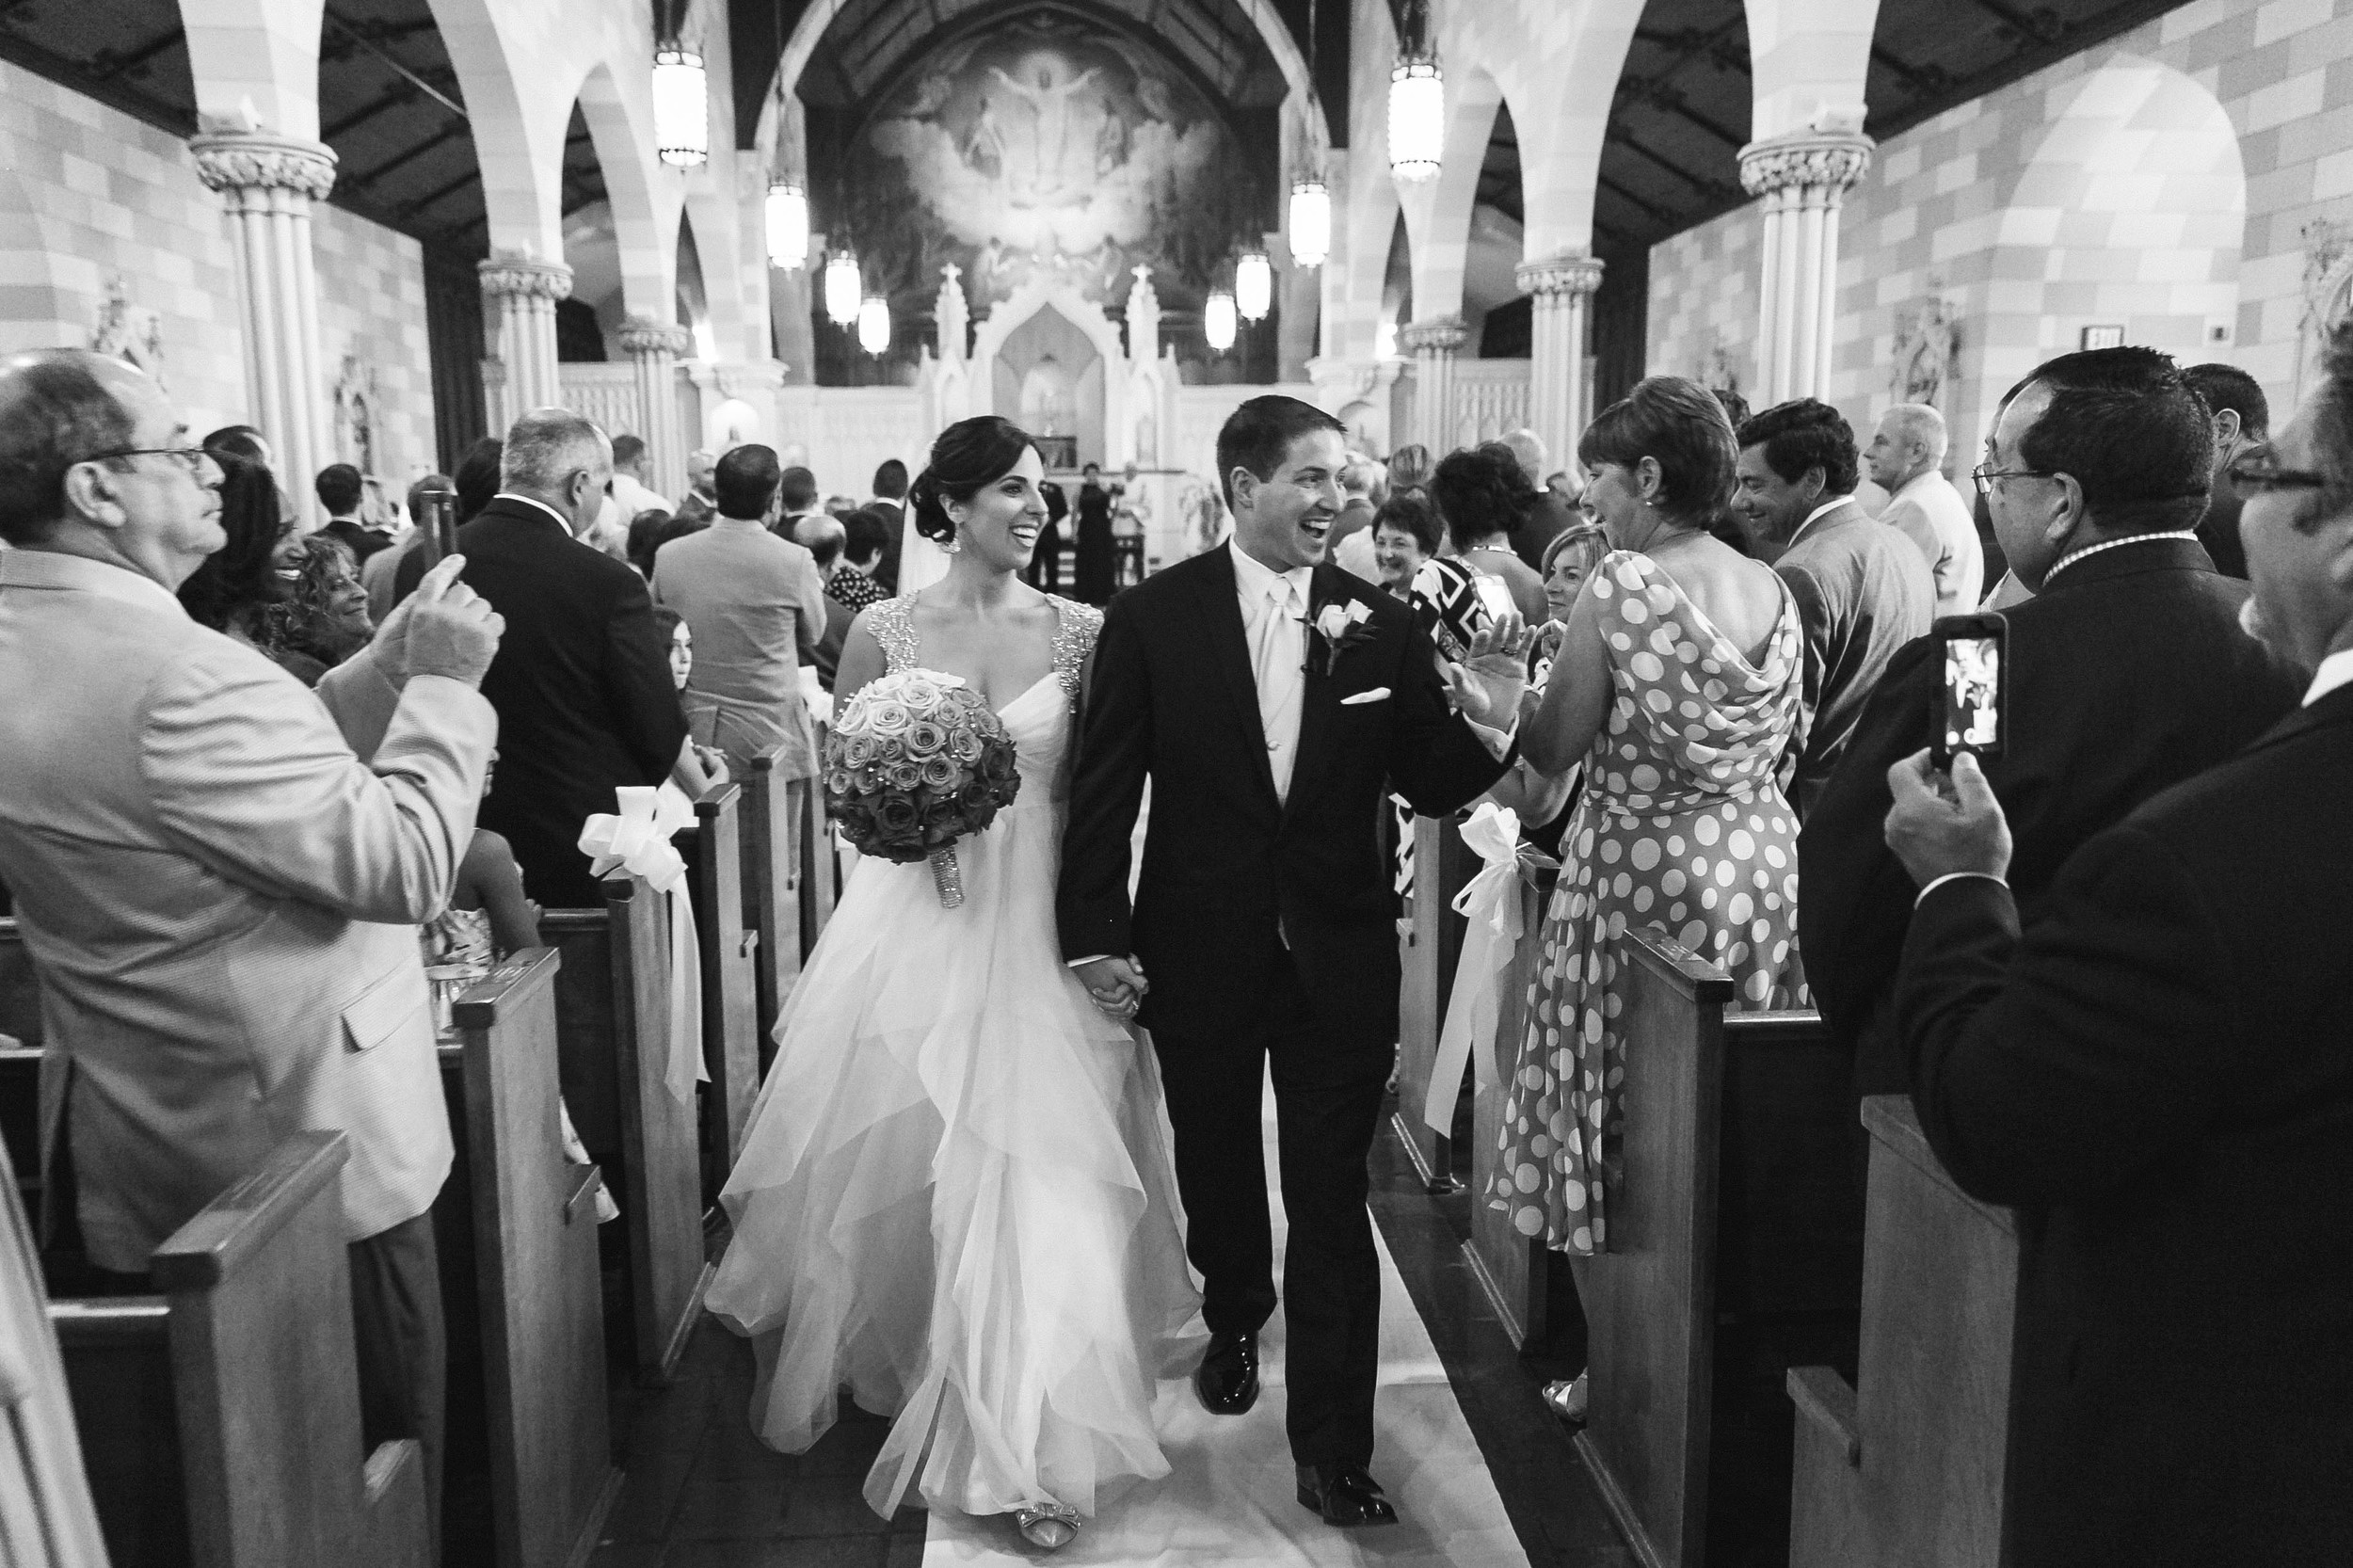 Photo-Journalistic-Wedding-Photography-by-Jacek-Dolata-CT-MA-RI-NJ-NYC-NY-VT-NH-PA-45.jpg